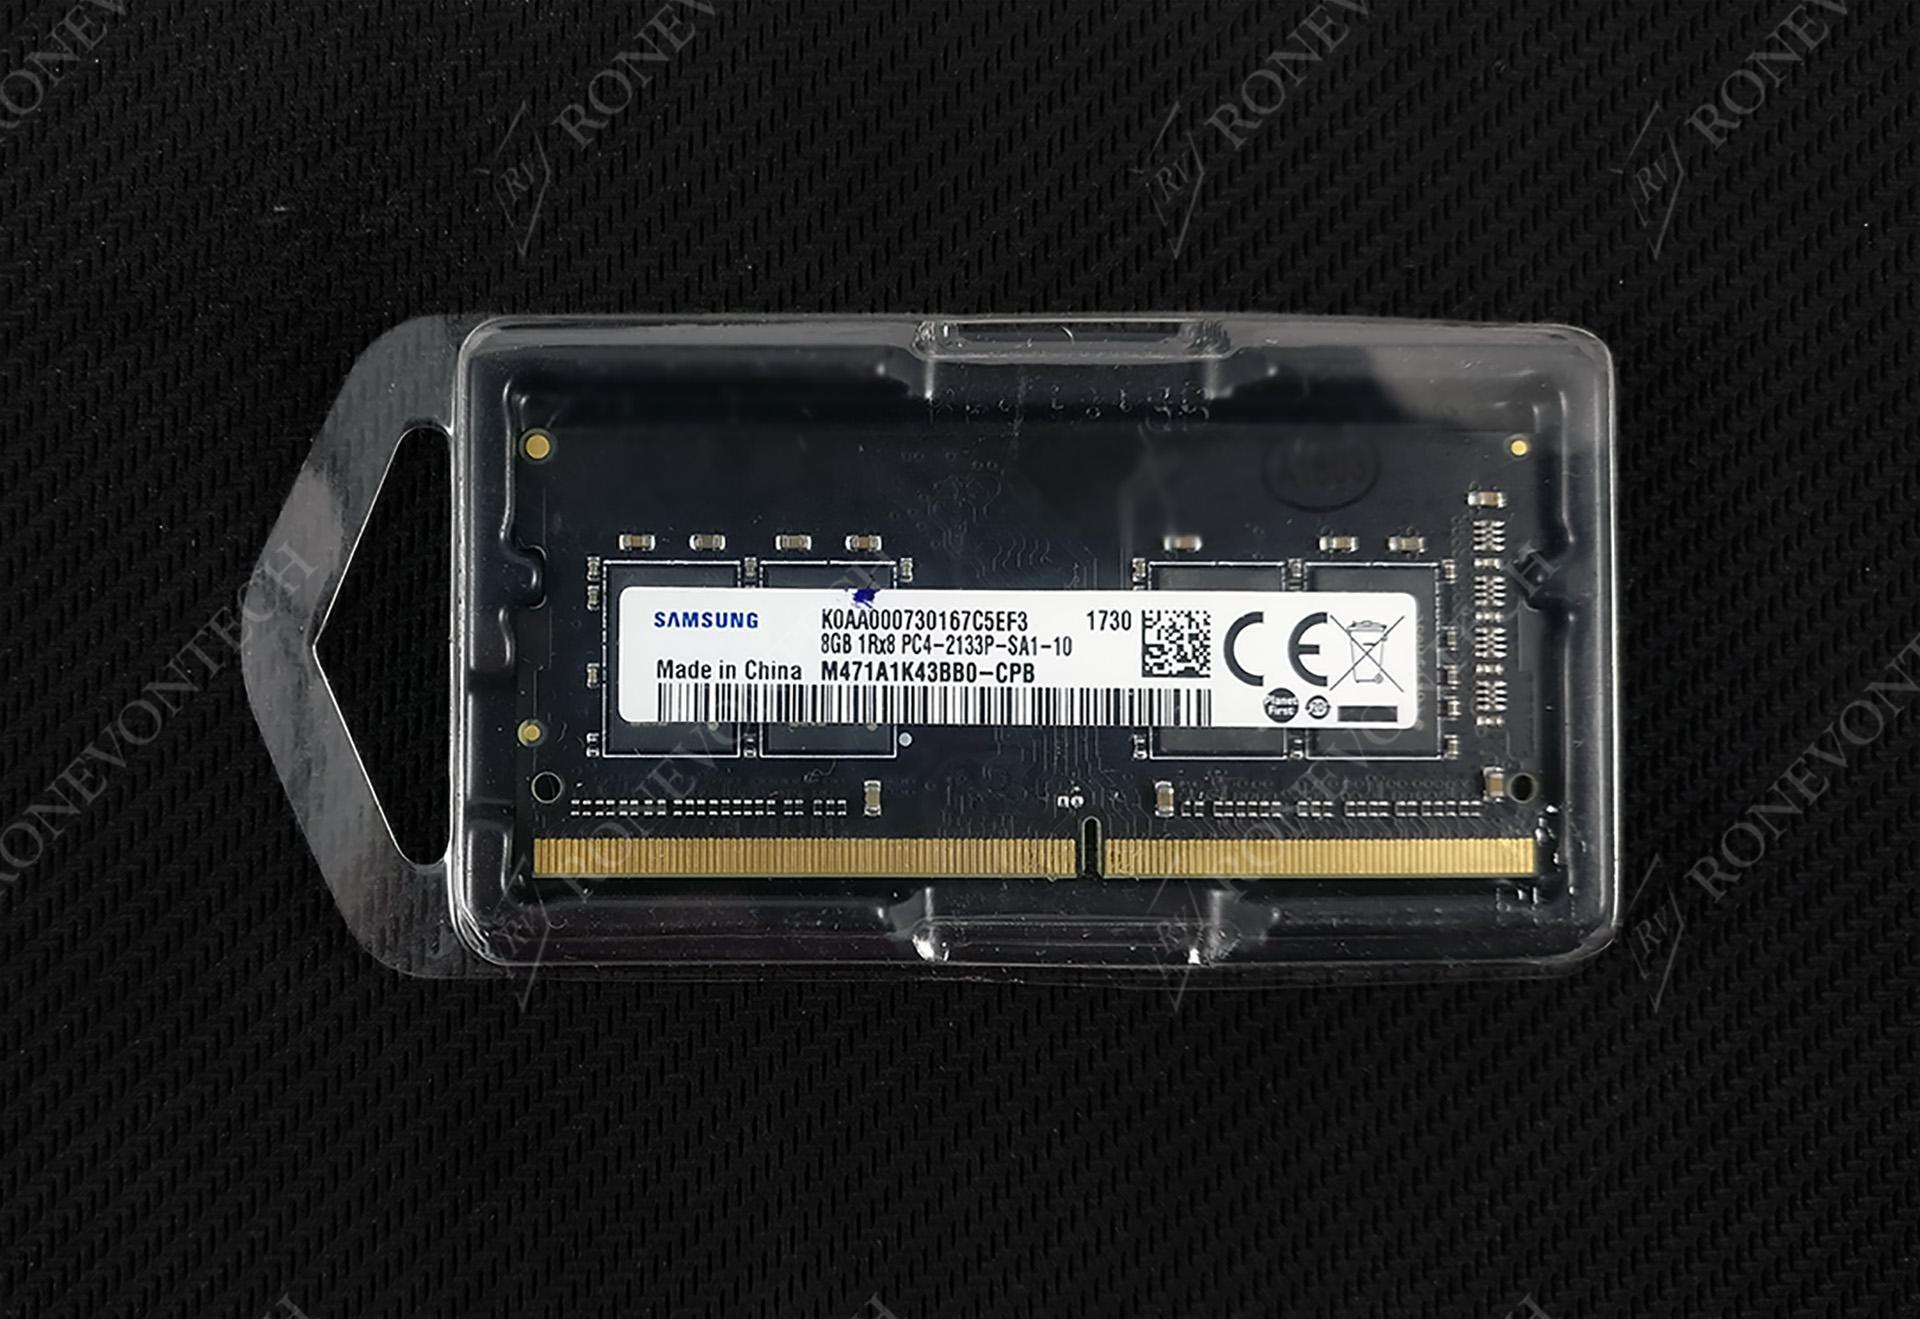 RAM Samsung 8GB DDR4 2133 (PC4-17000) SO-DIMM Laptop Memory